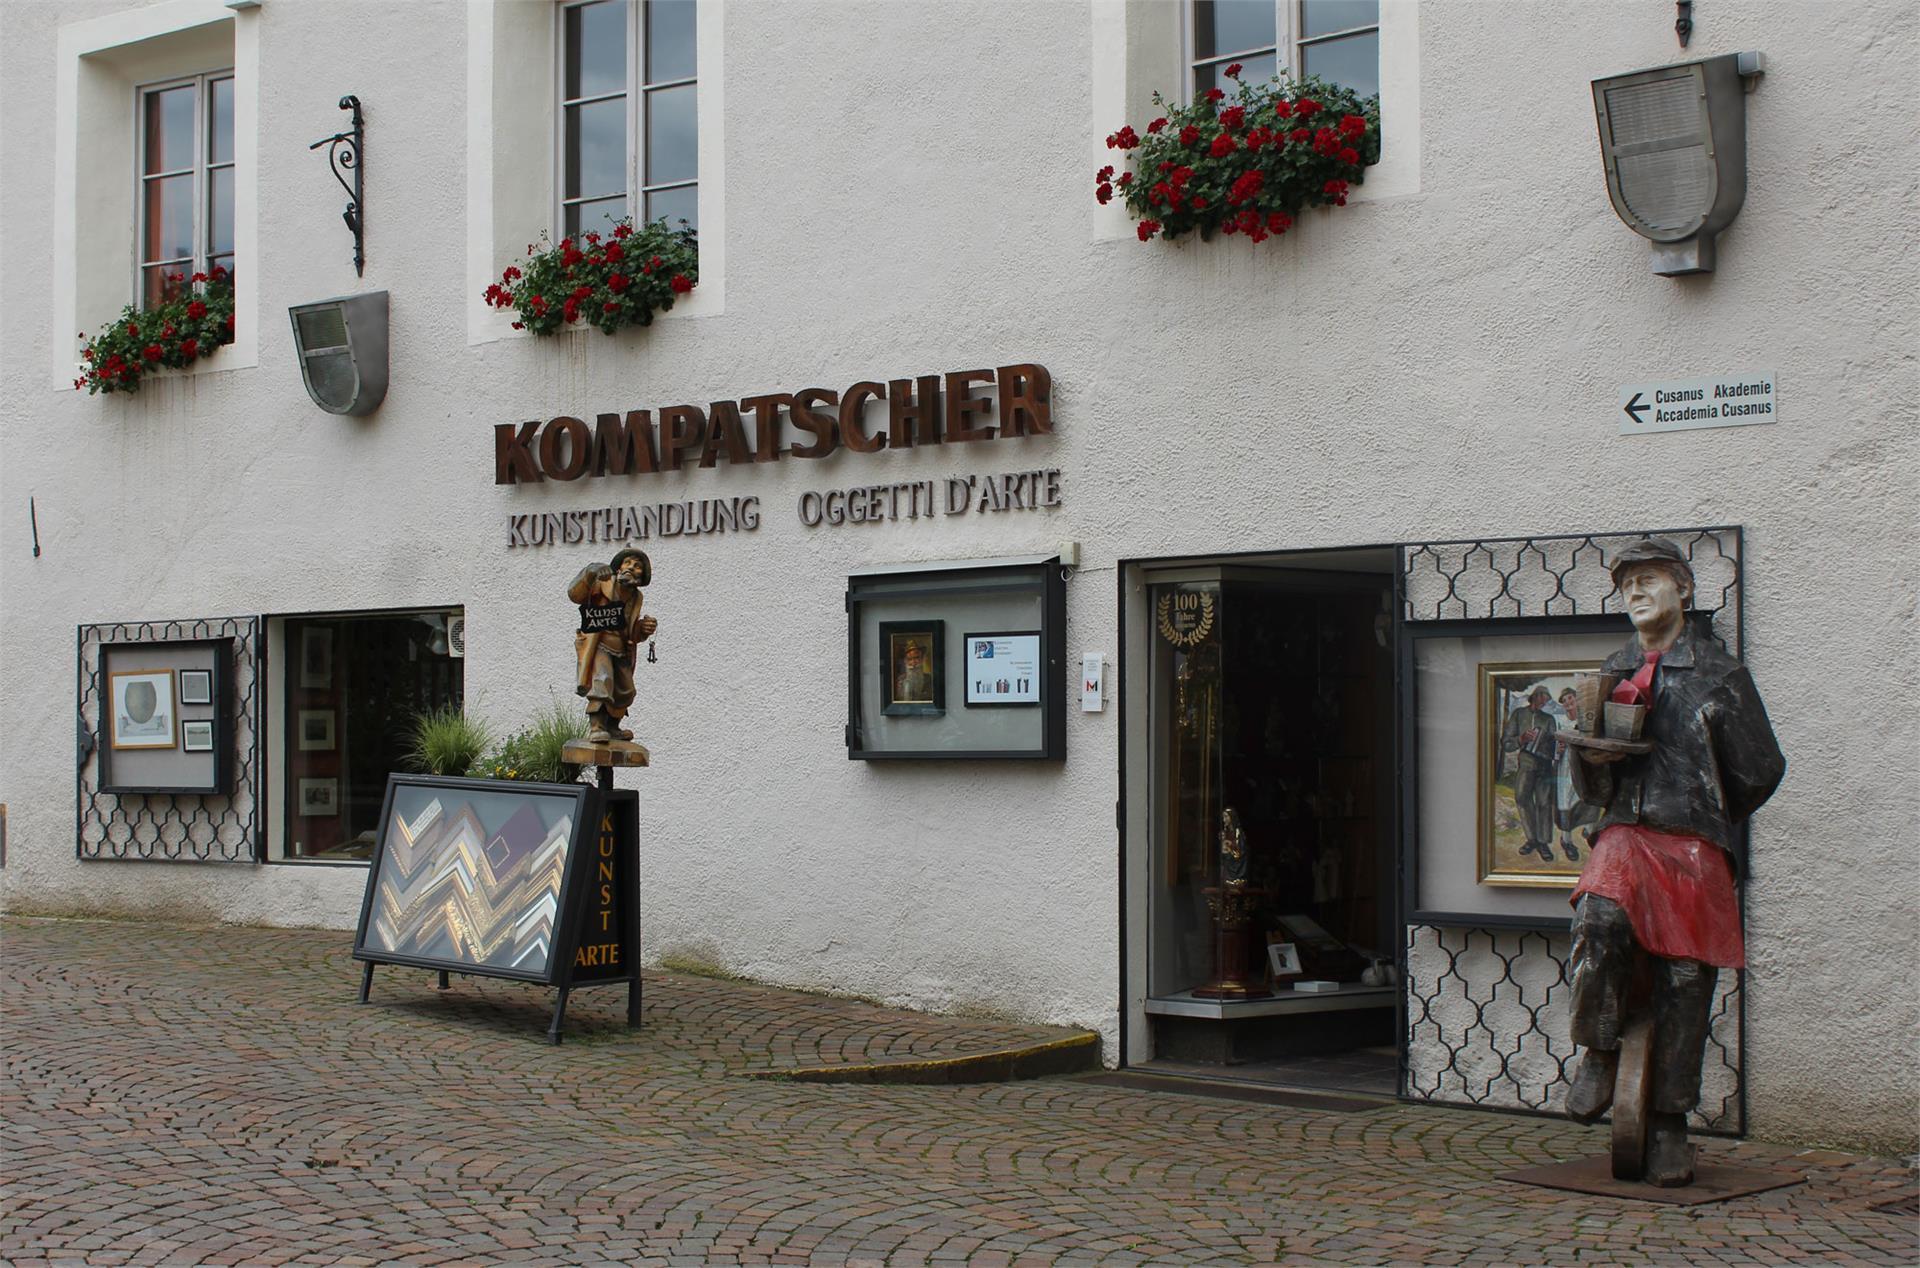 Galeria artigianale Kompatscher